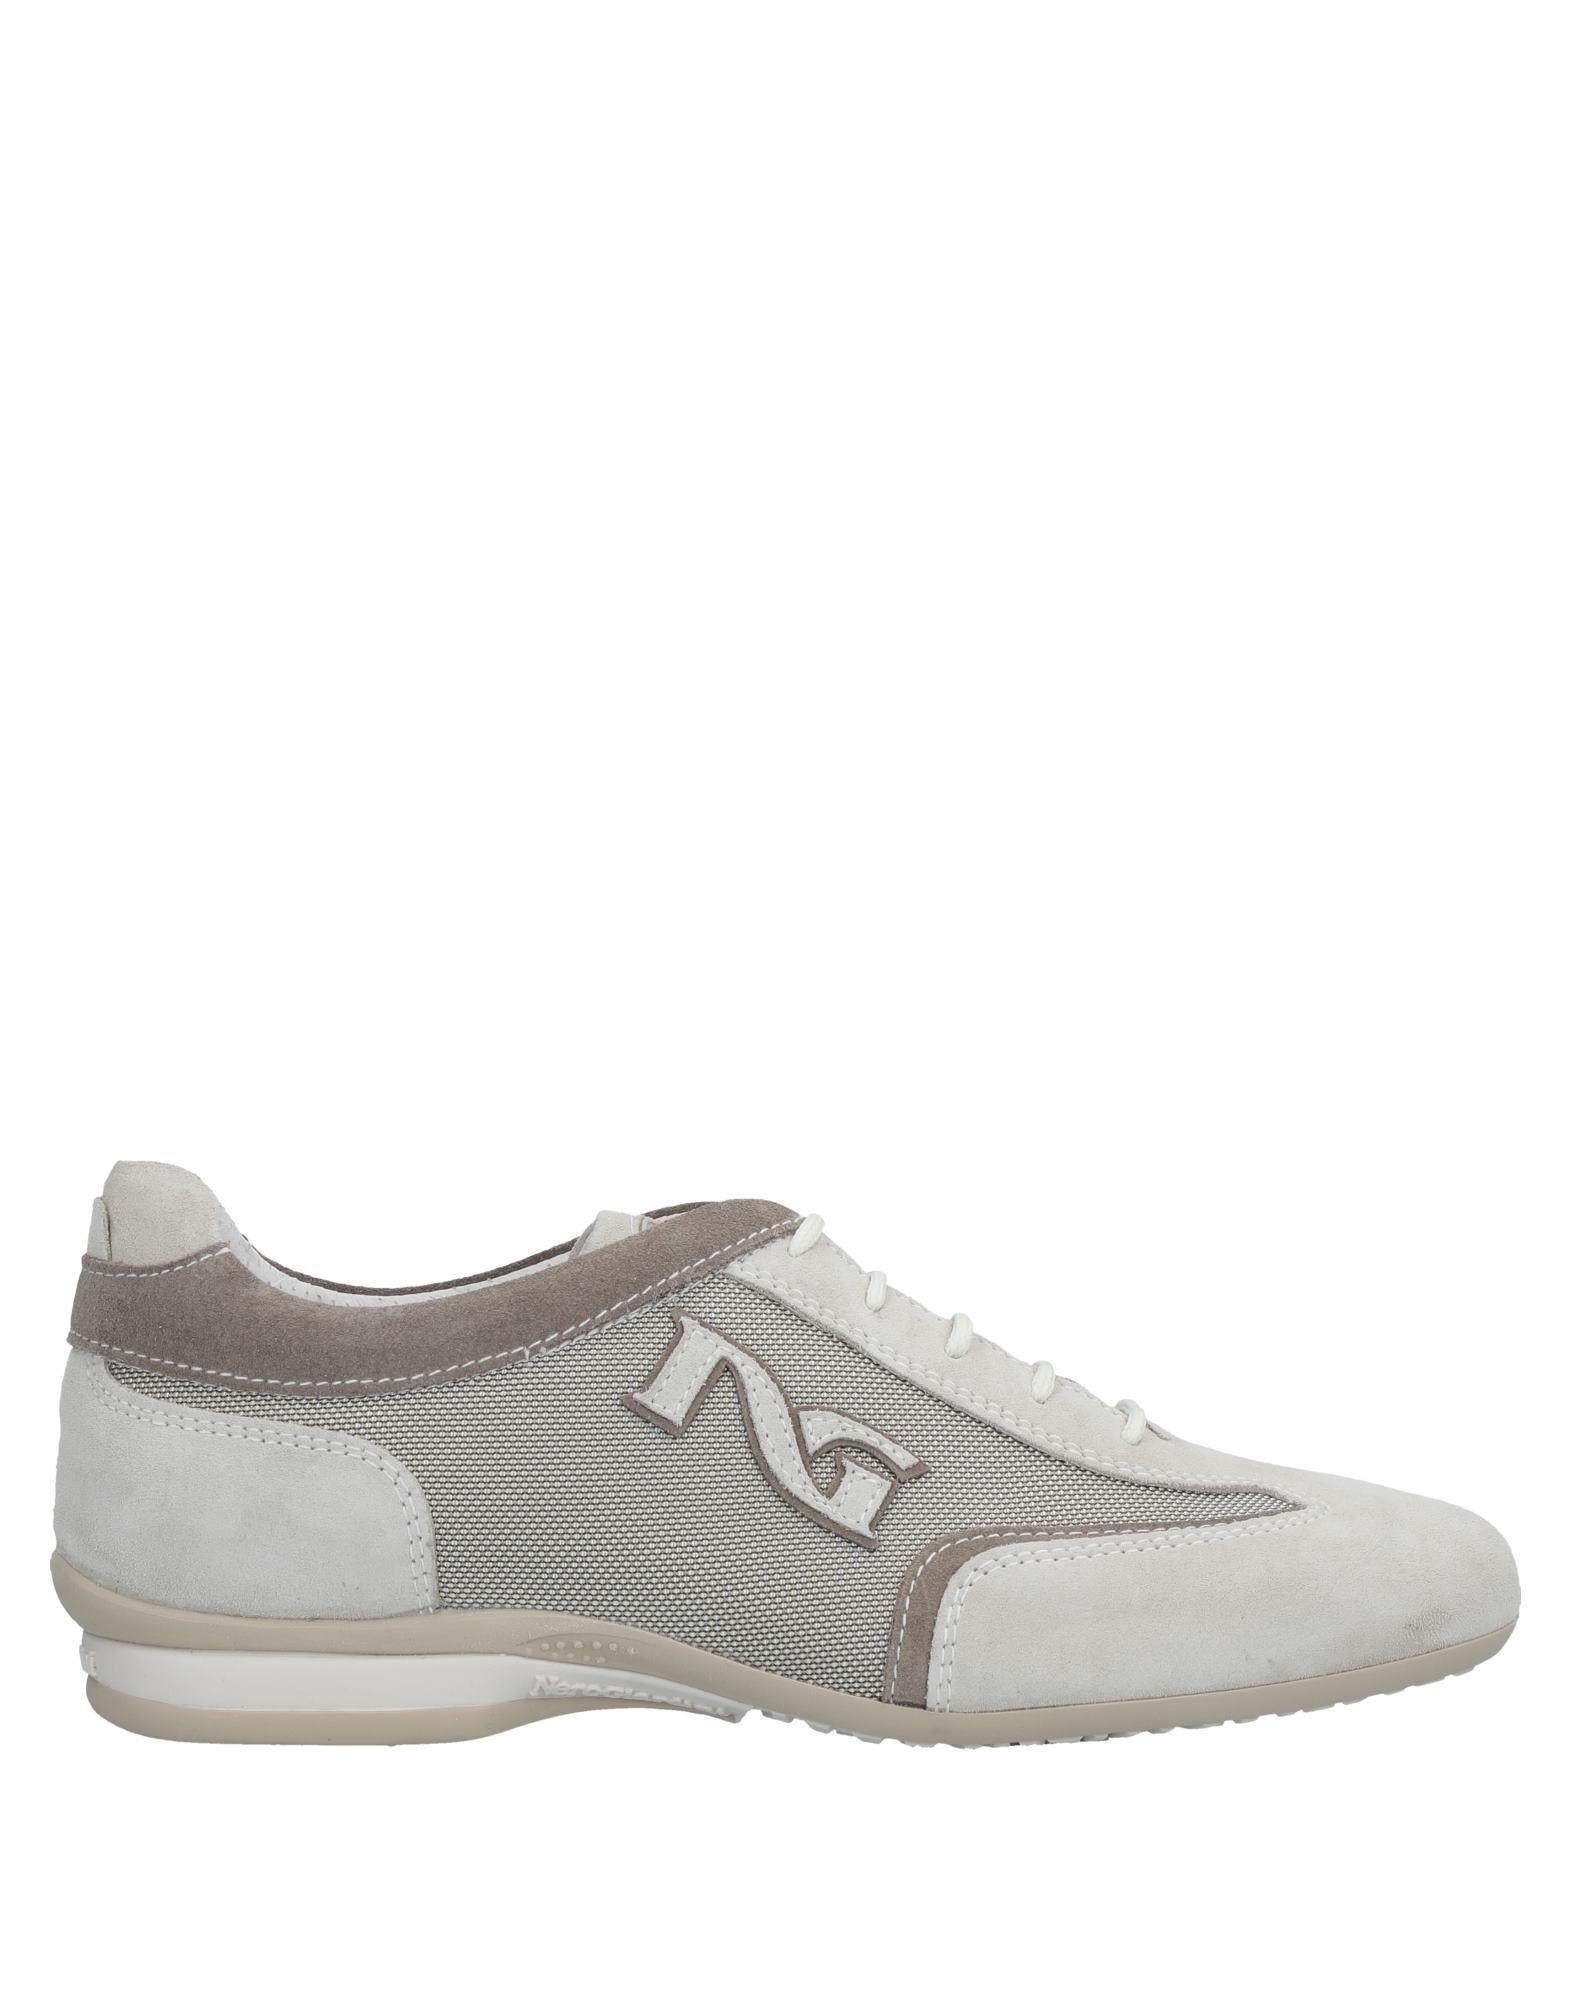 Nero Giardini Sneakers Damen  11523186KH Gute Qualität beliebte Schuhe